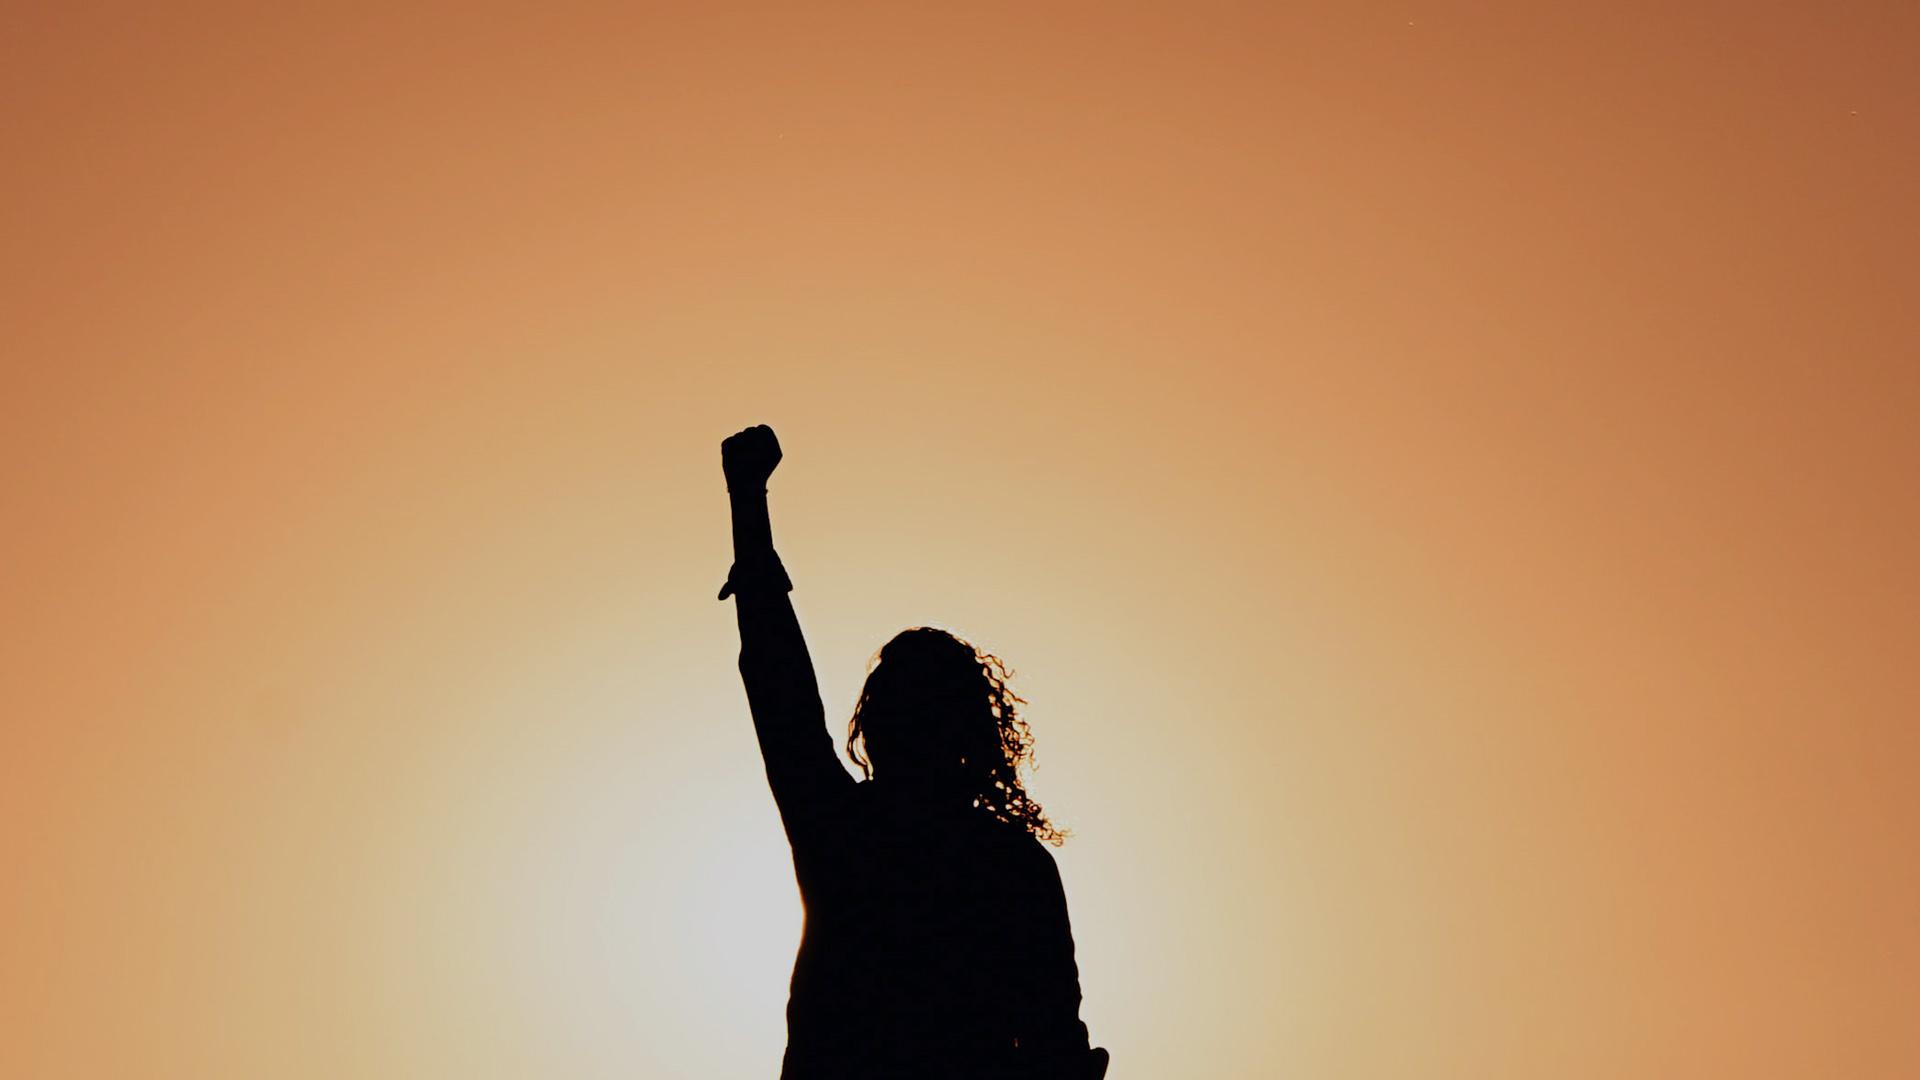 A SHIFT TOWARDS FEMININE ENERGY IN ORGANIZATIONAL CULTURES